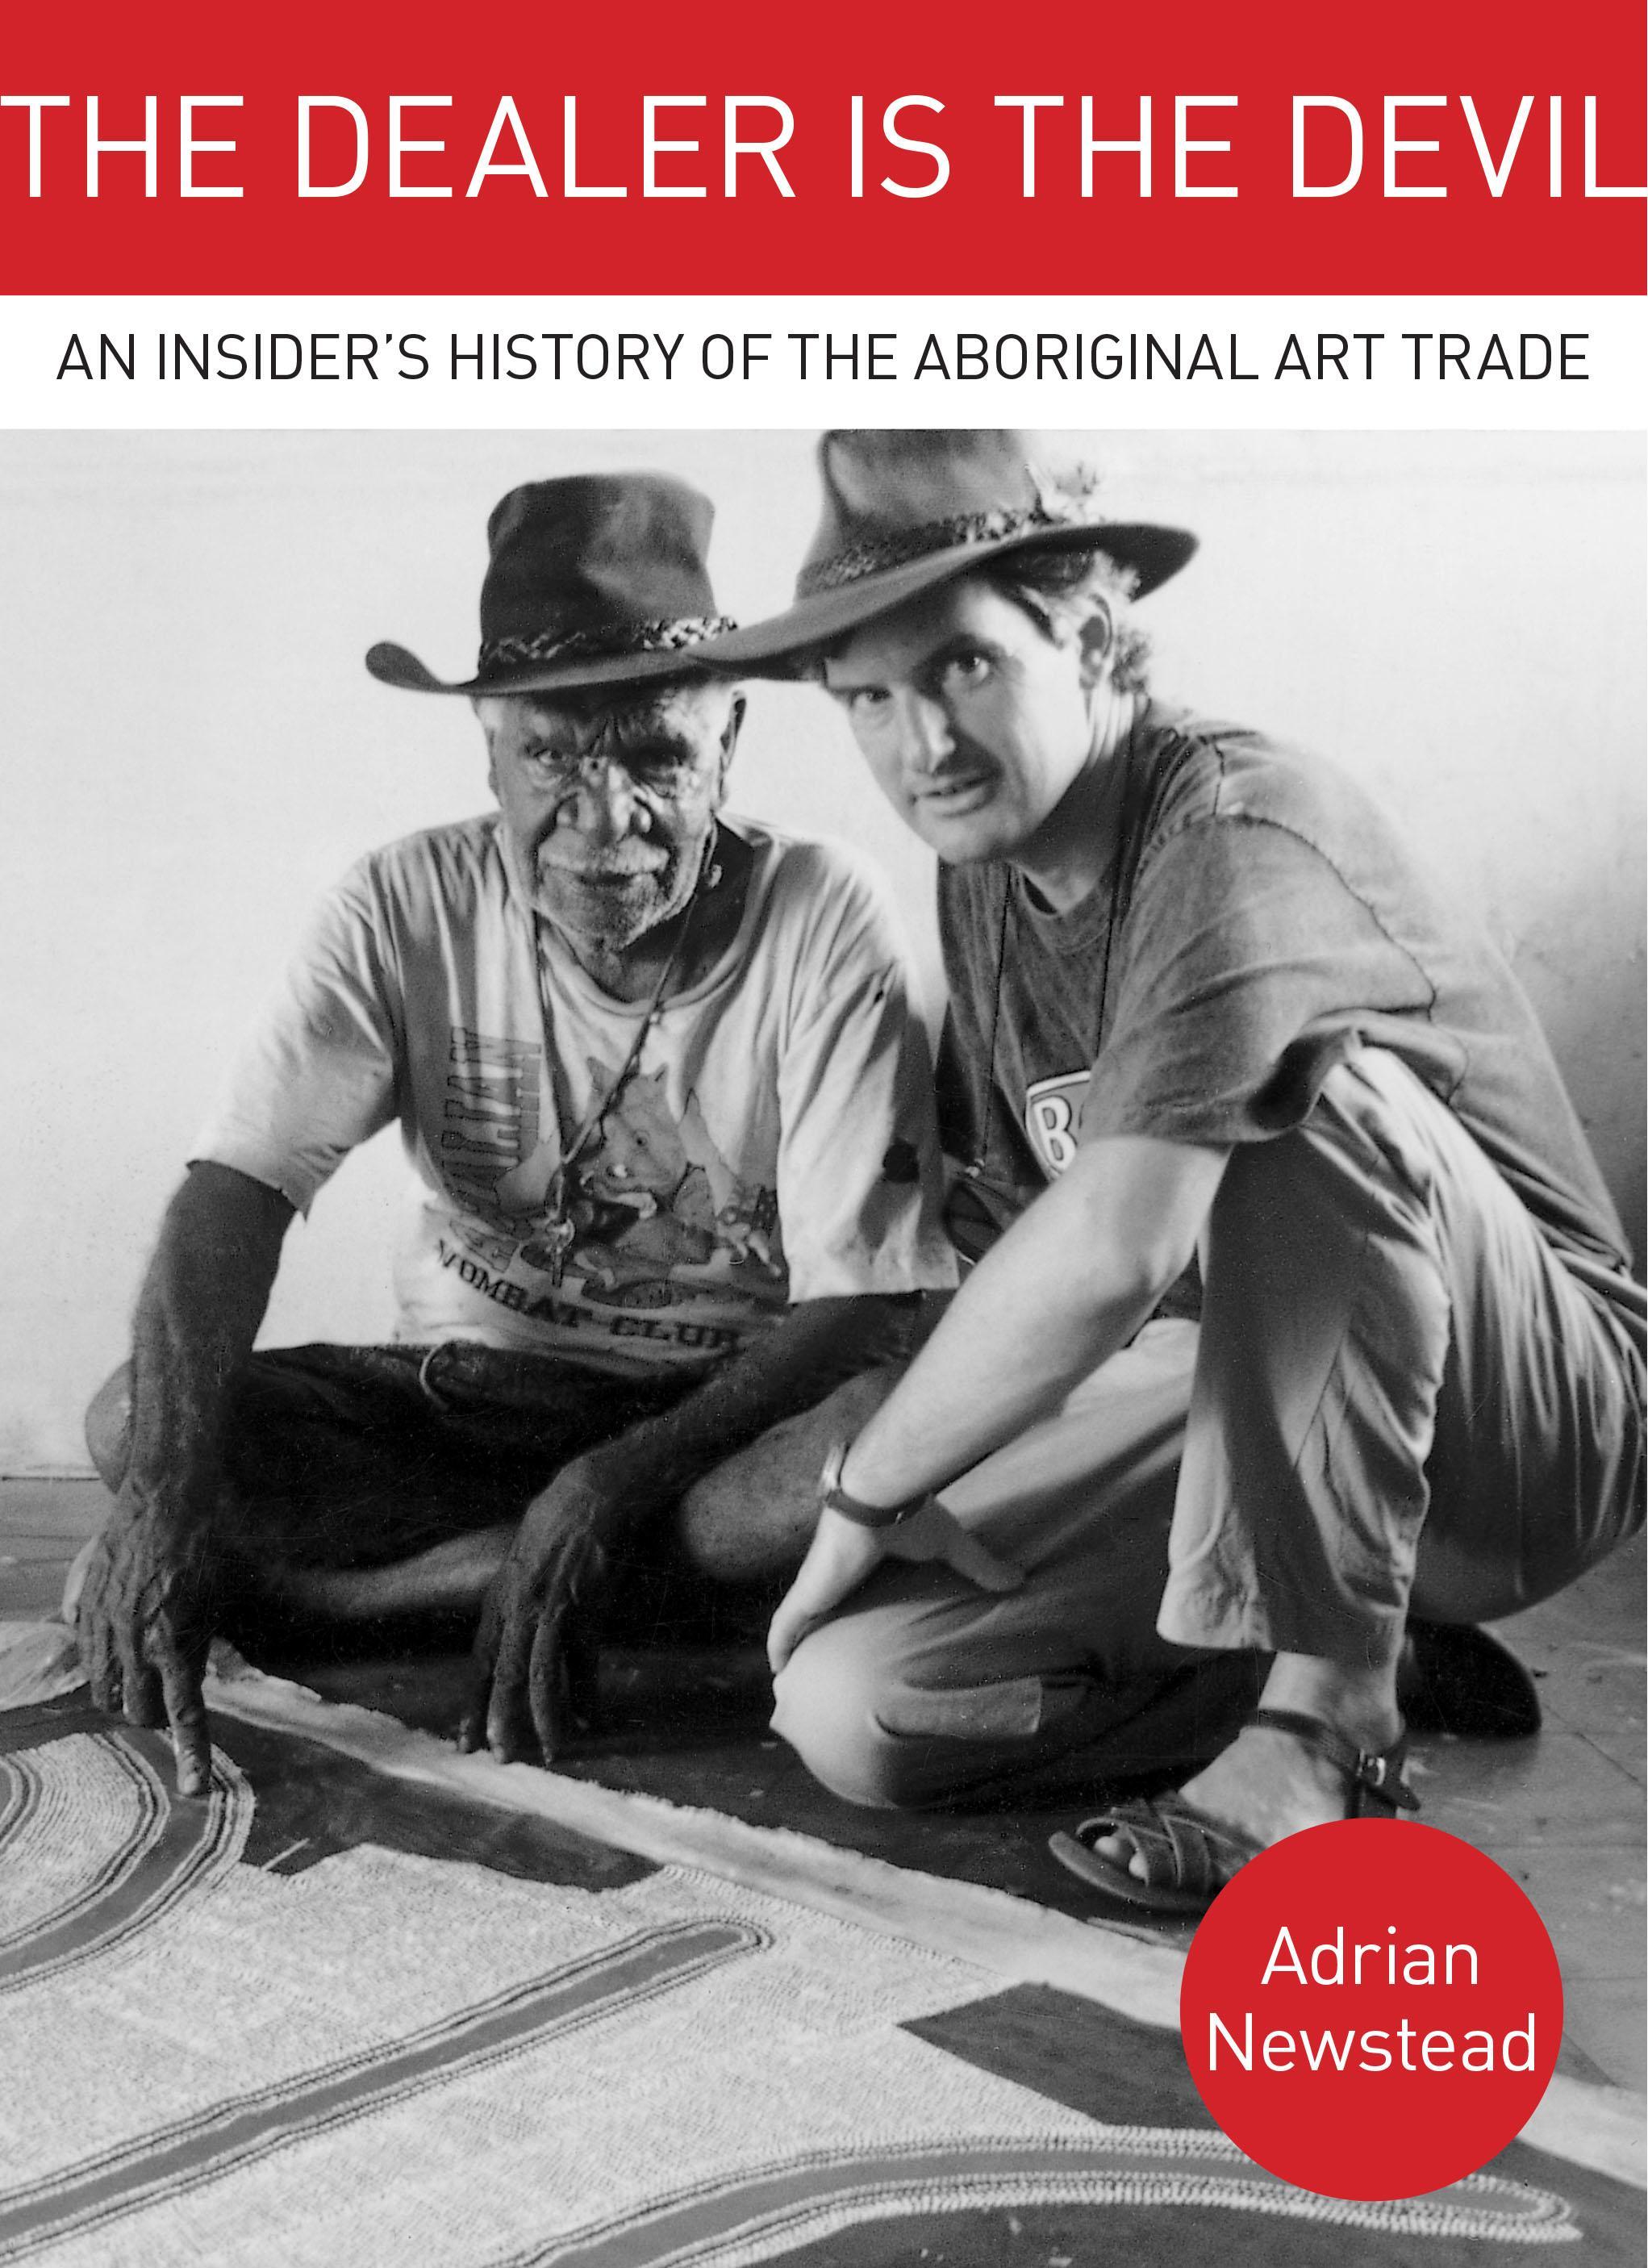 The Dealer is the Devil: Inside the Aboriginalarttrade